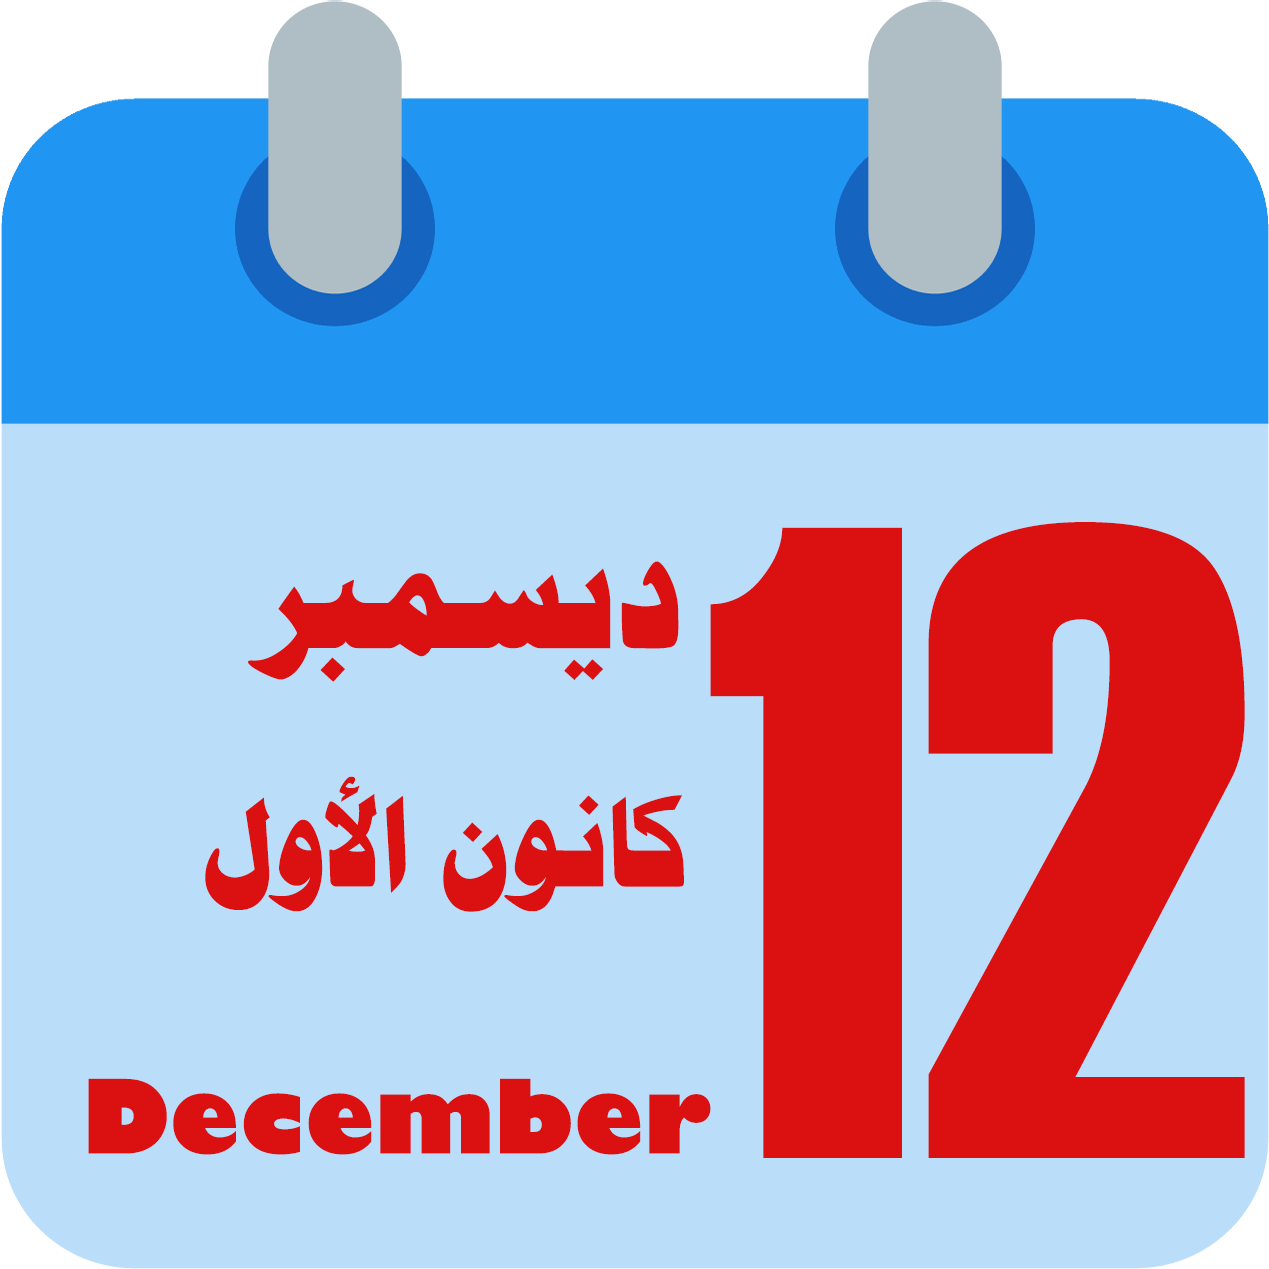 شهر ديسمبر